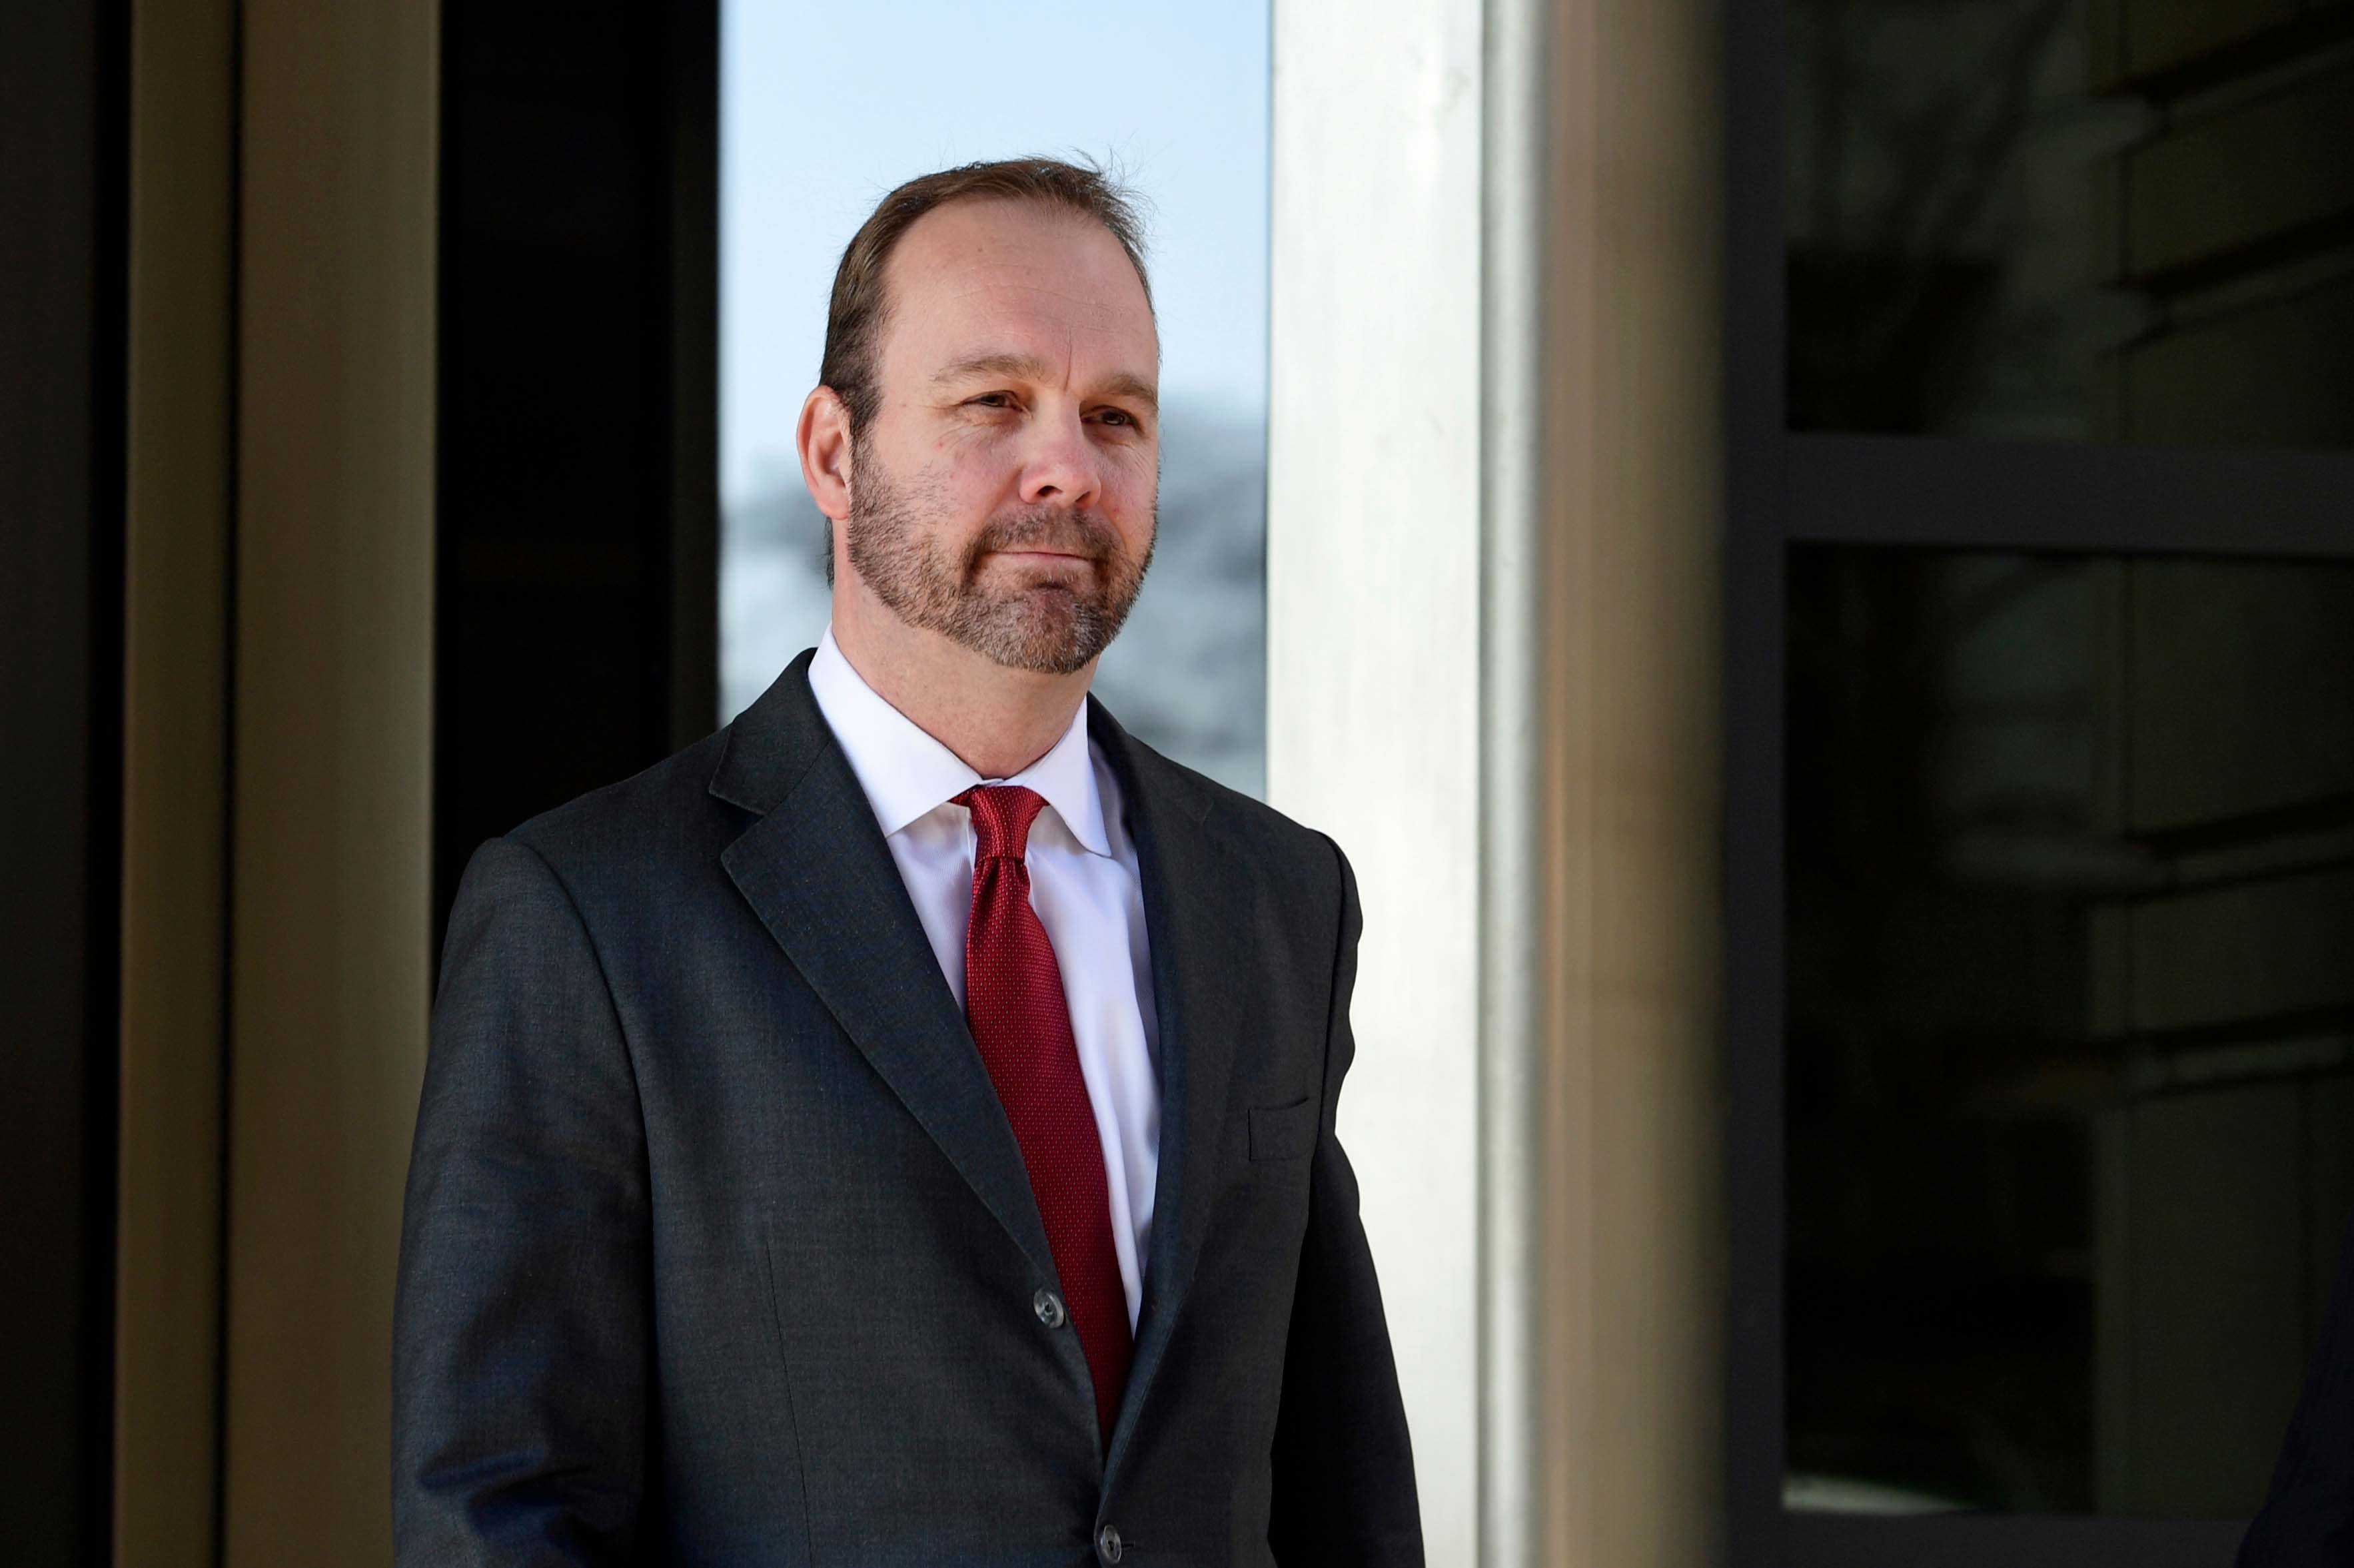 Former Manafort deputy Rick Gates testifies against Greg Craig